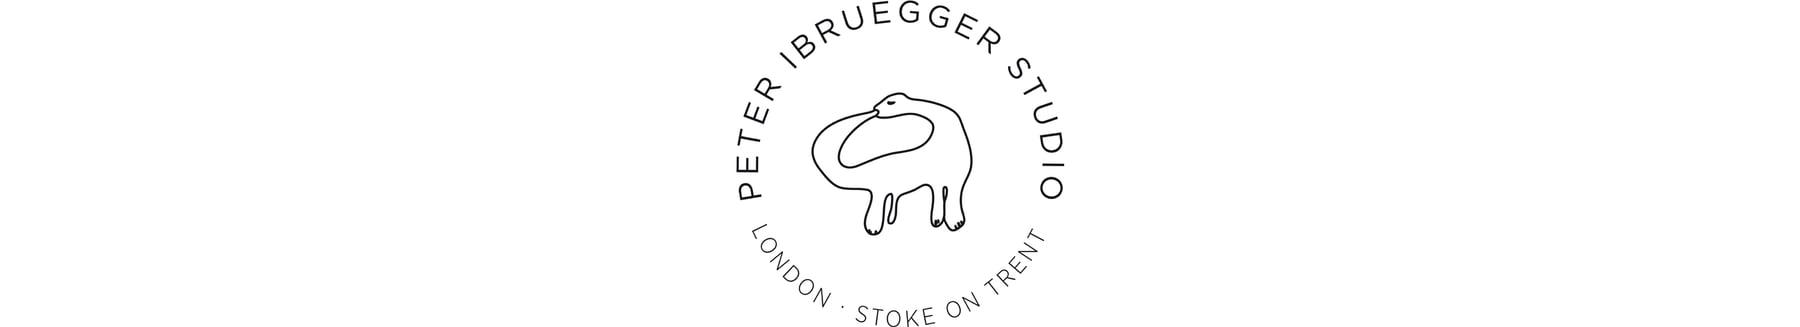 Peter Ibruegger